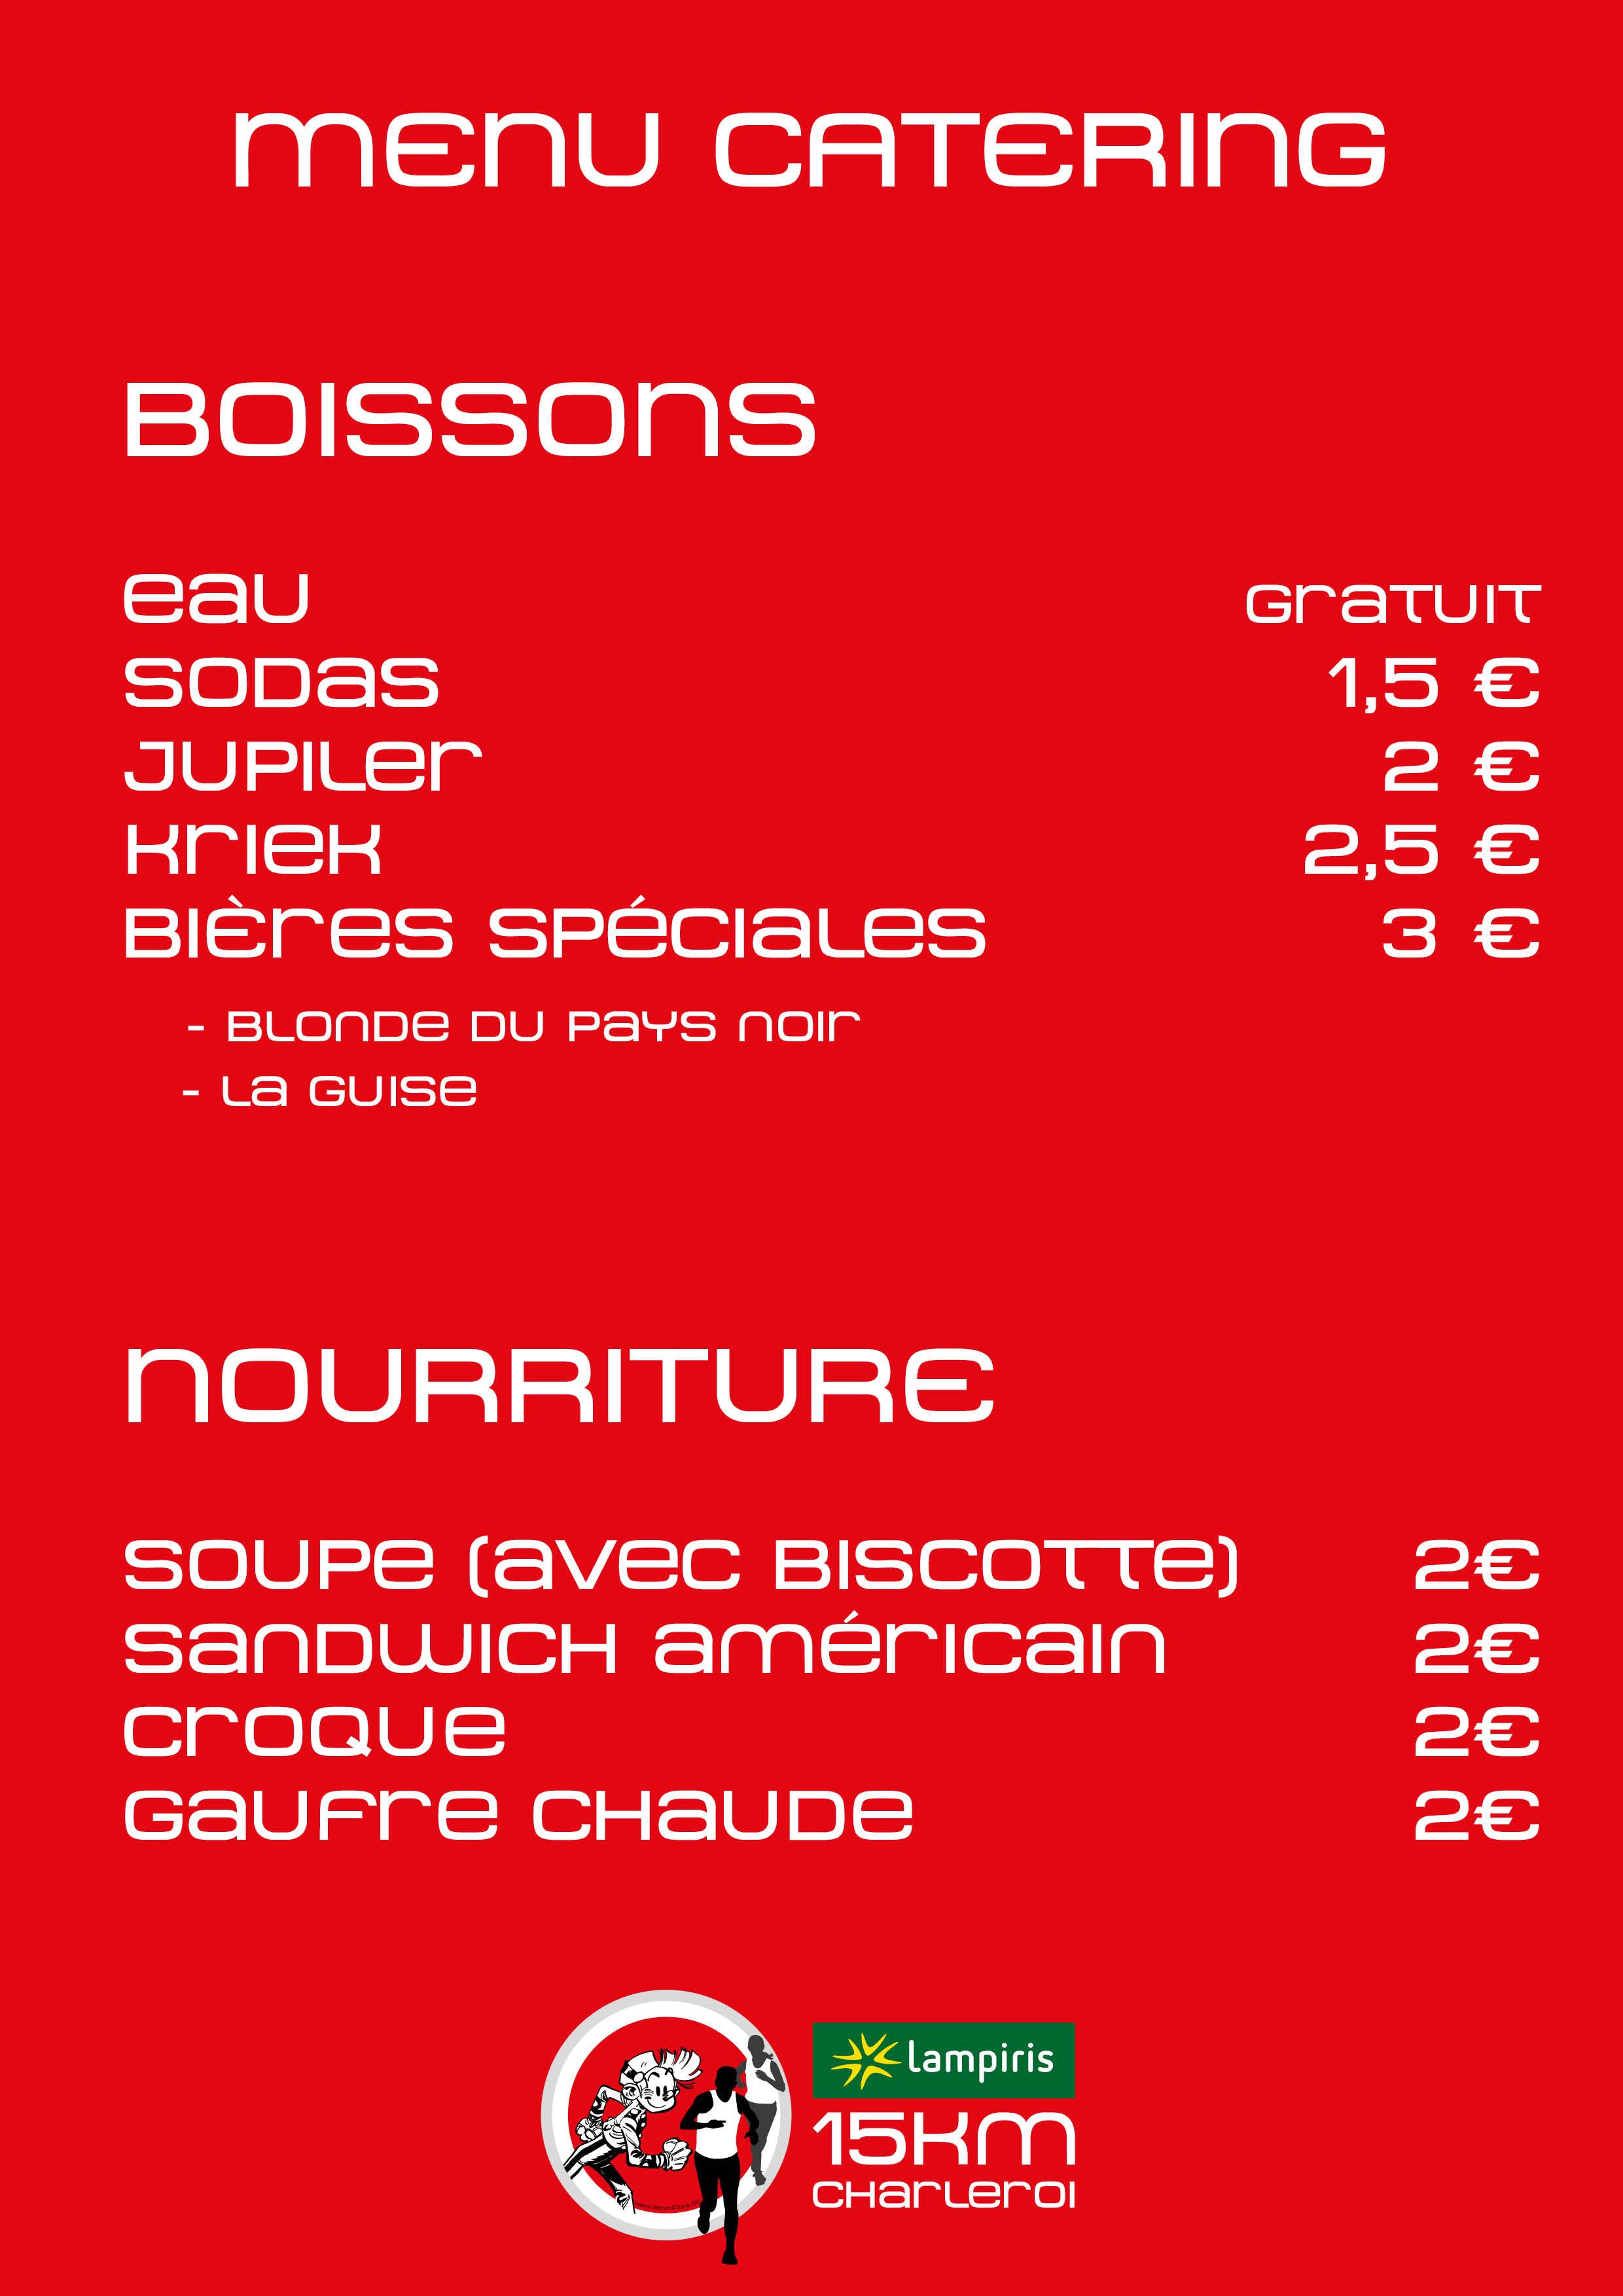 15km Charleroi - catering